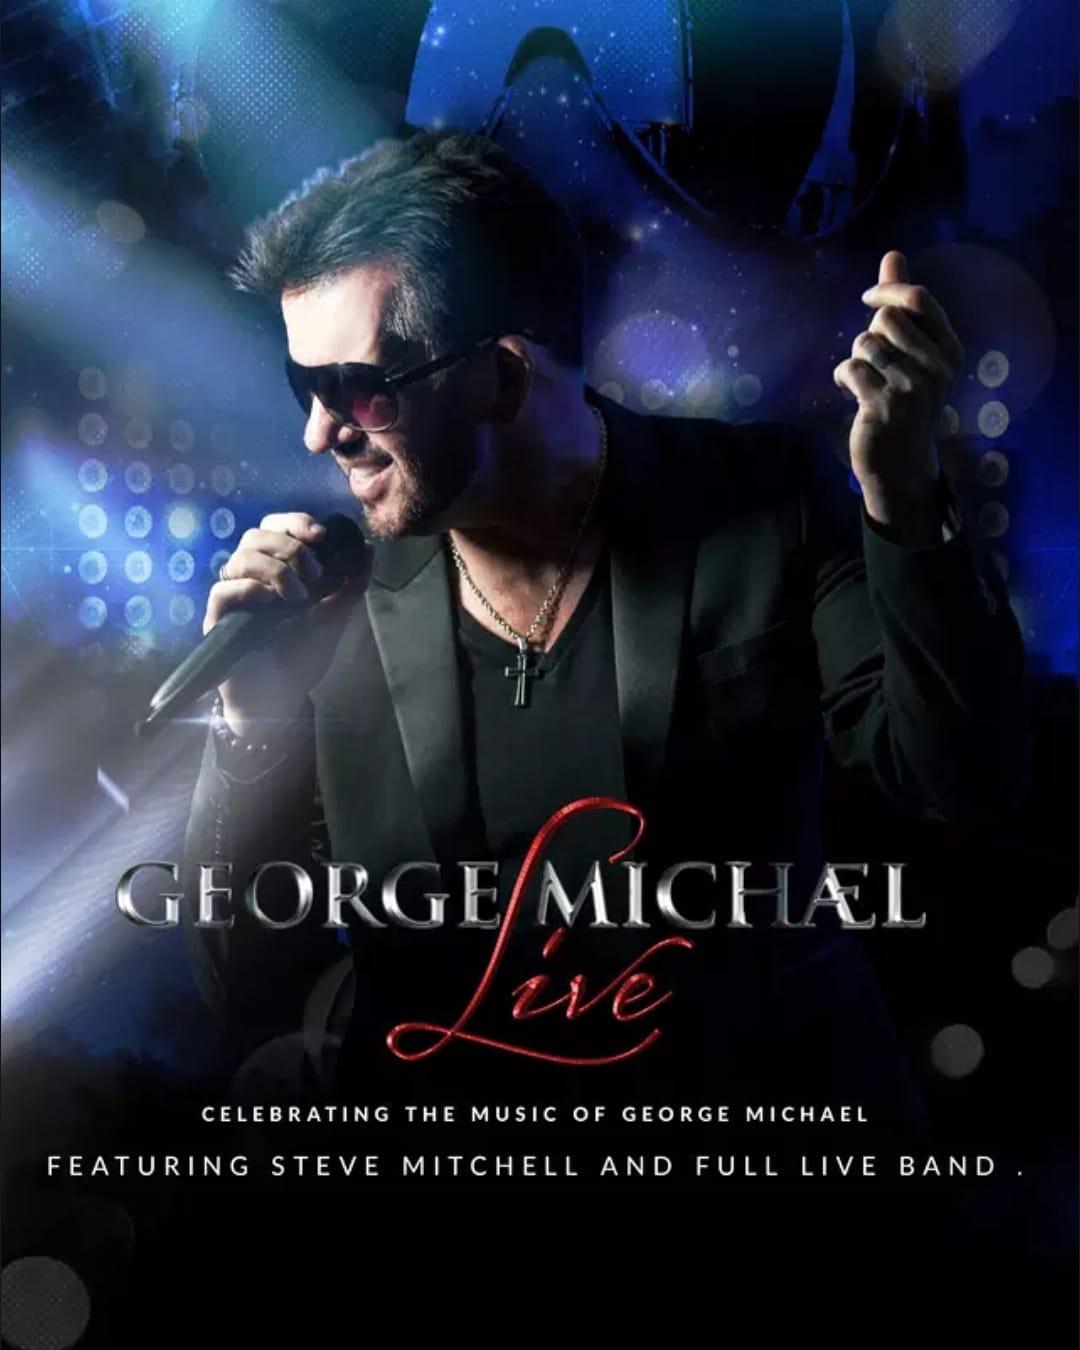 George Michael Live